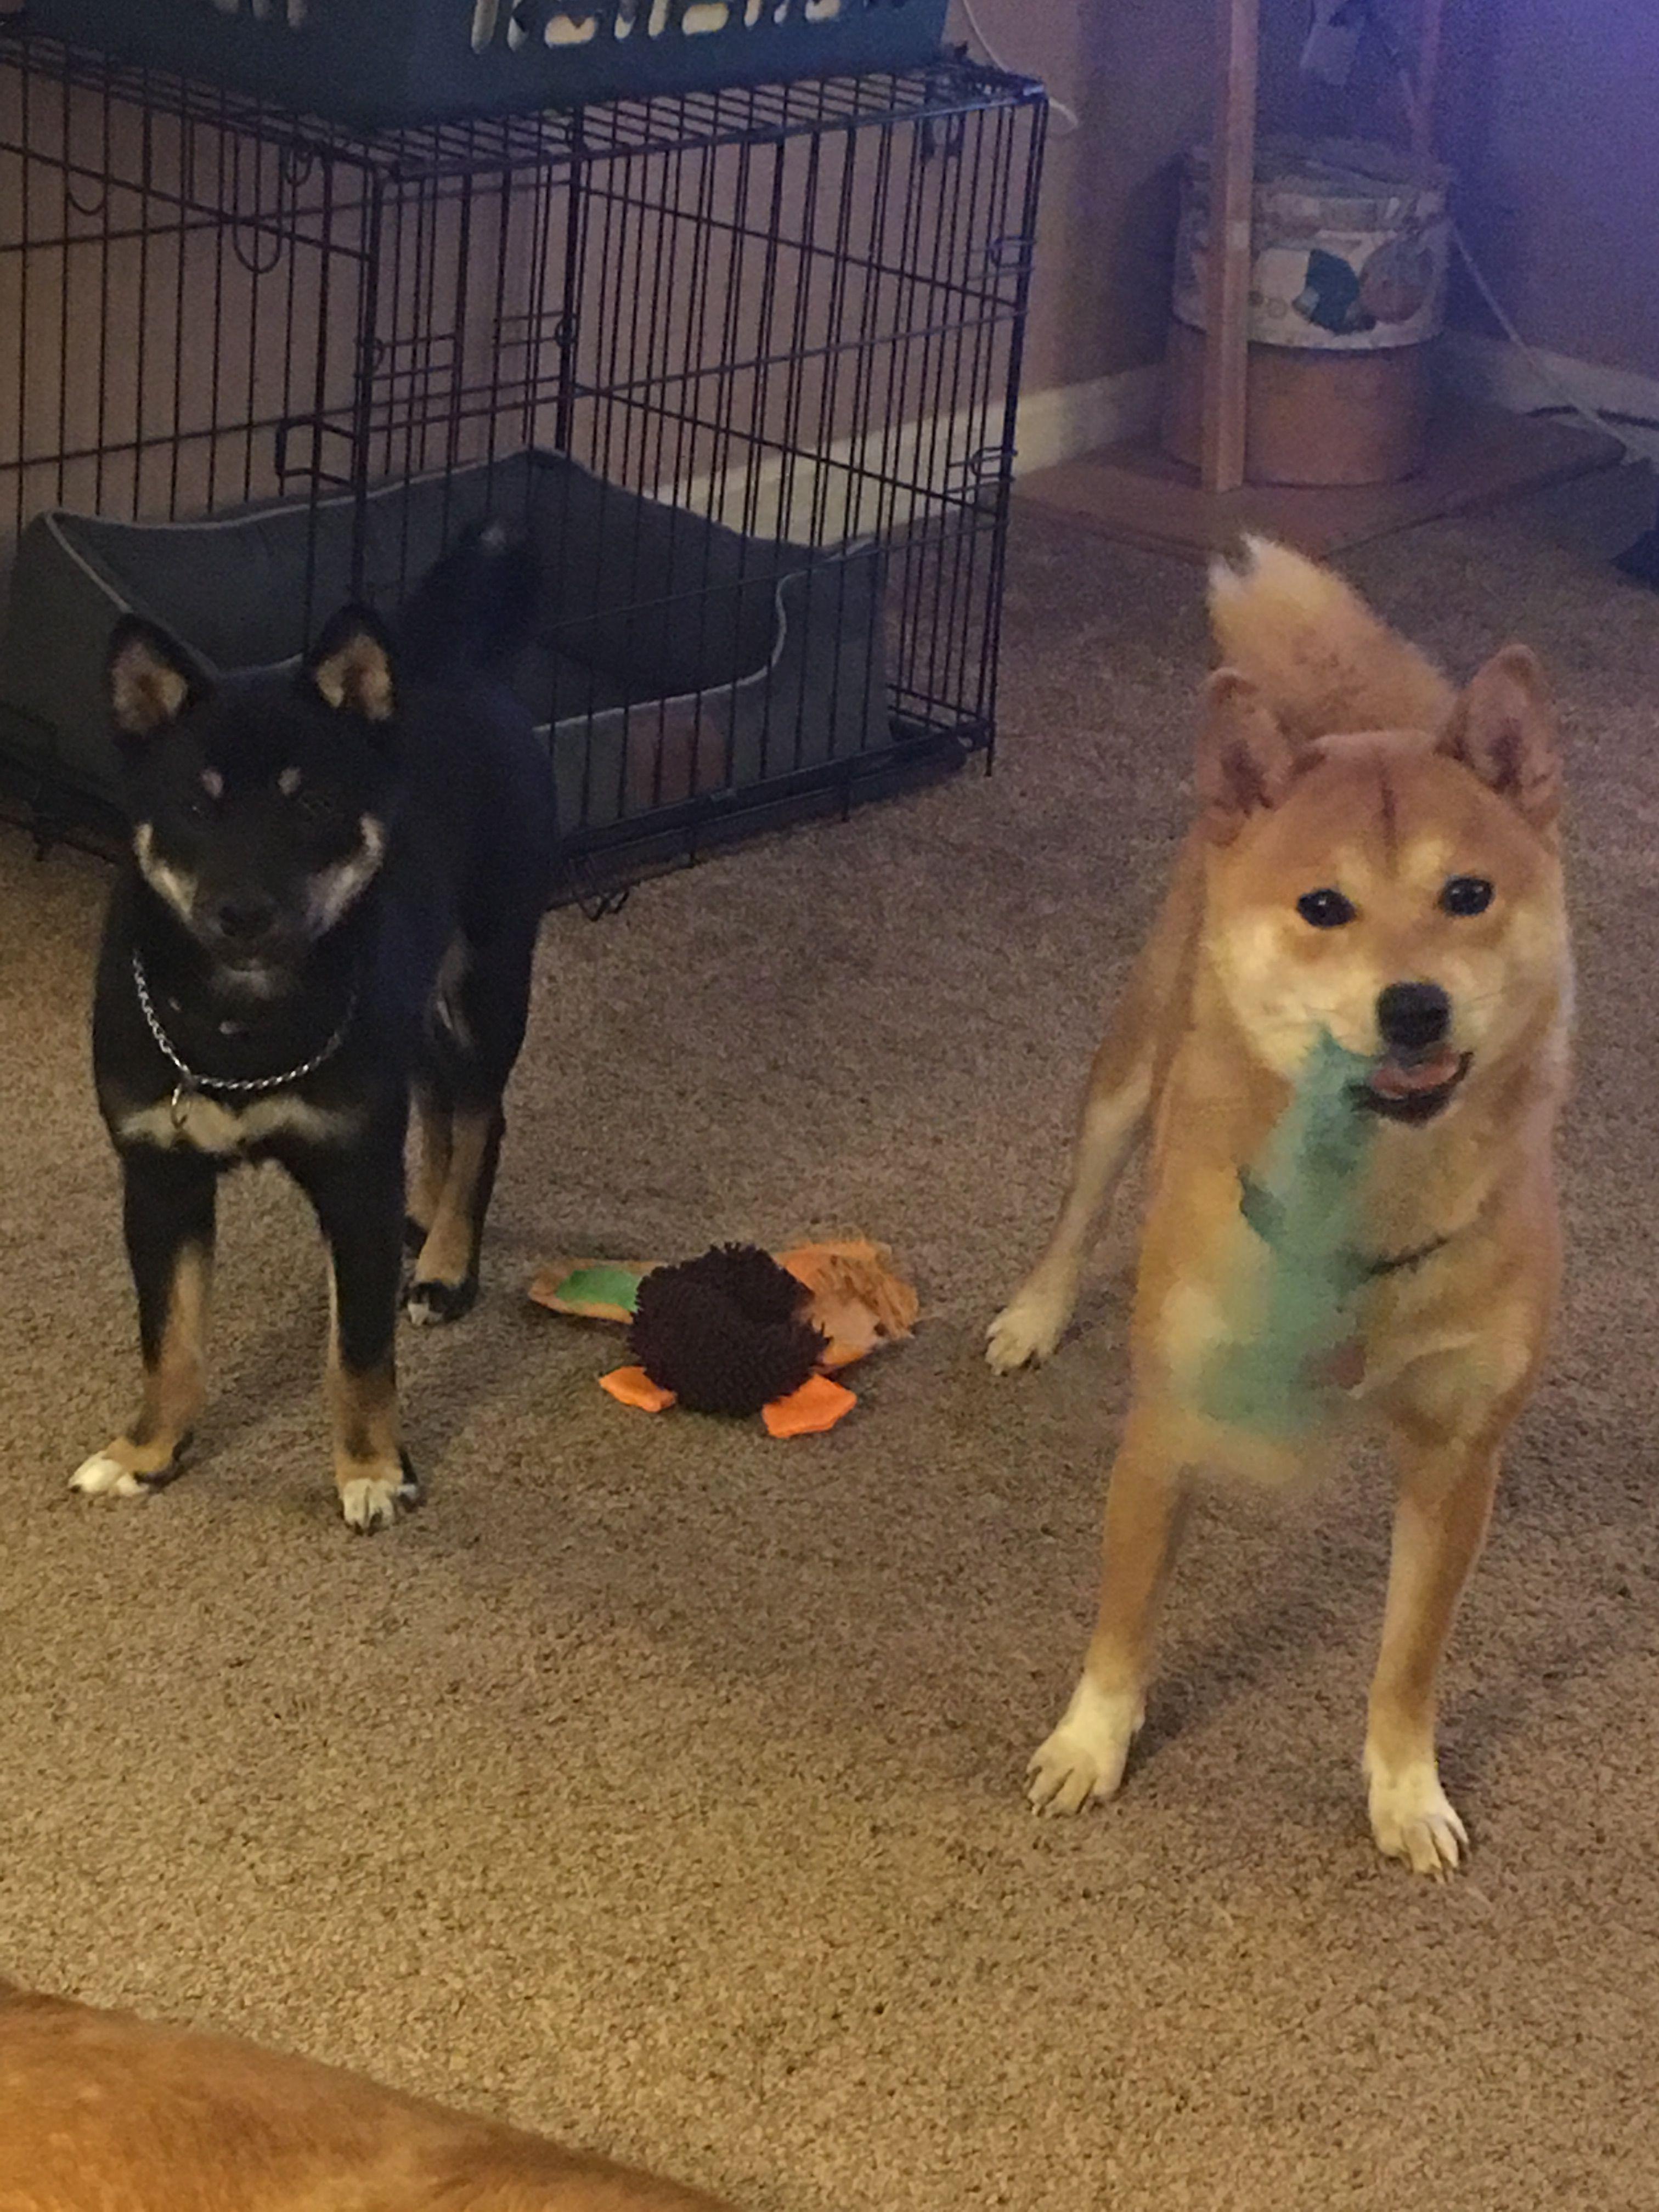 Crazy Shiba S Playing Up A Storm Animals Animals Dogs Shiba